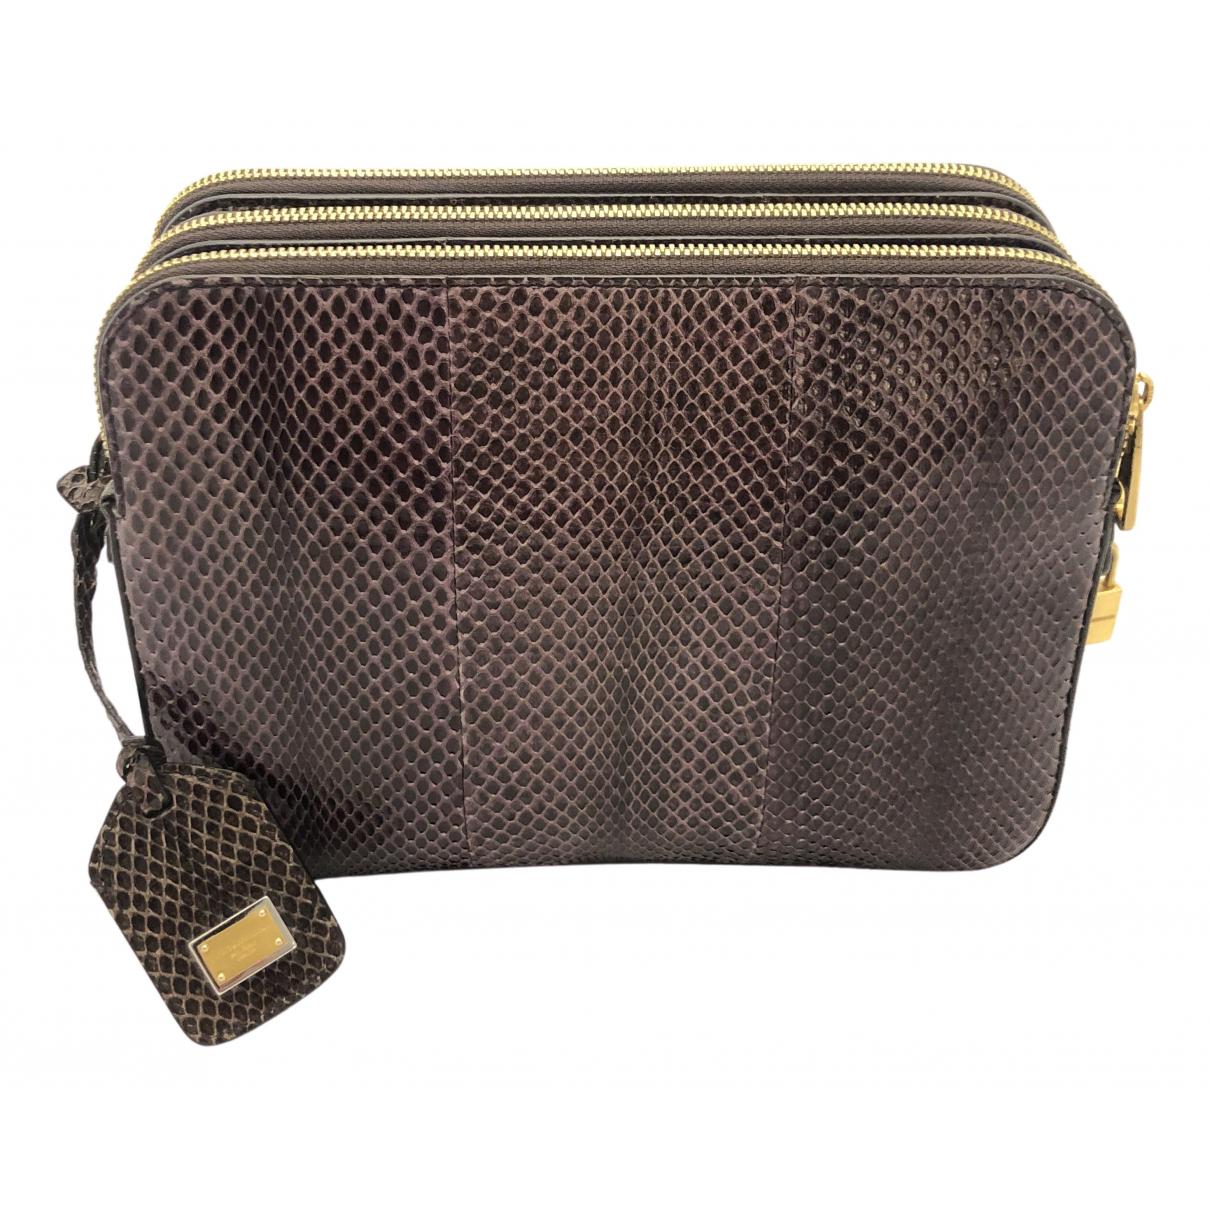 Dolce & Gabbana \N Purple Python handbag for Women \N